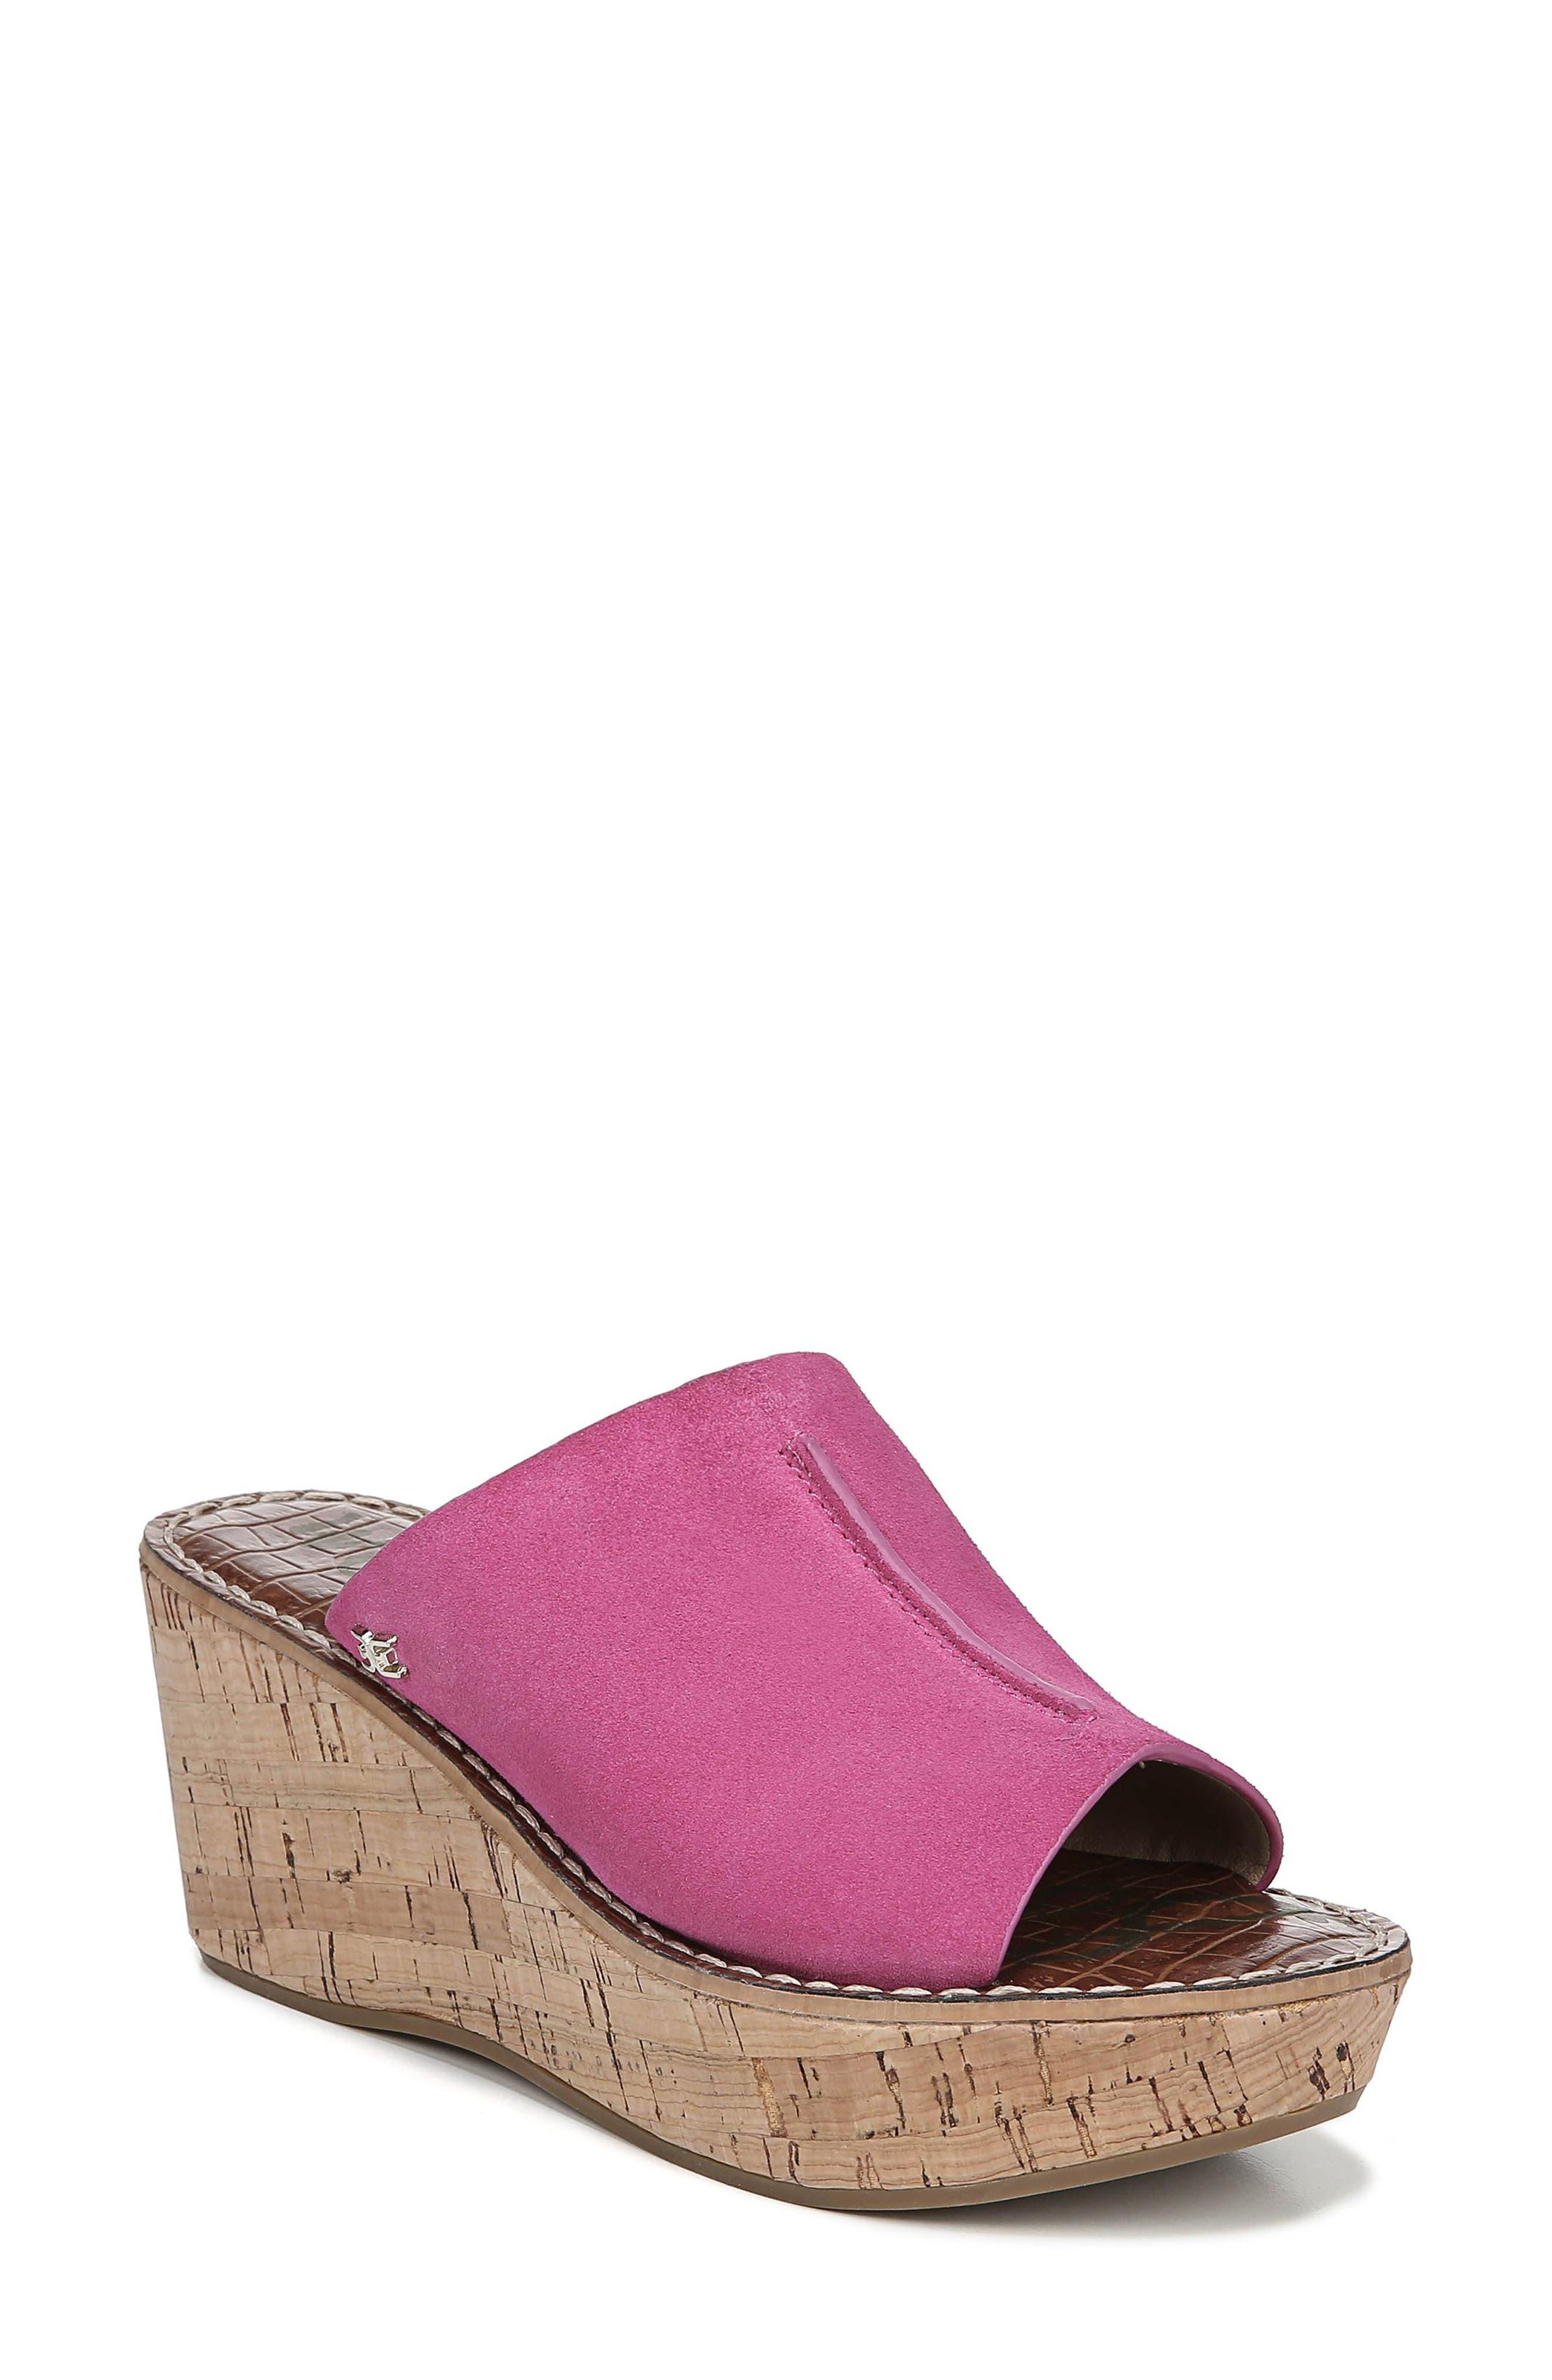 Sam Edelman Ranger Platform Sandal- Pink